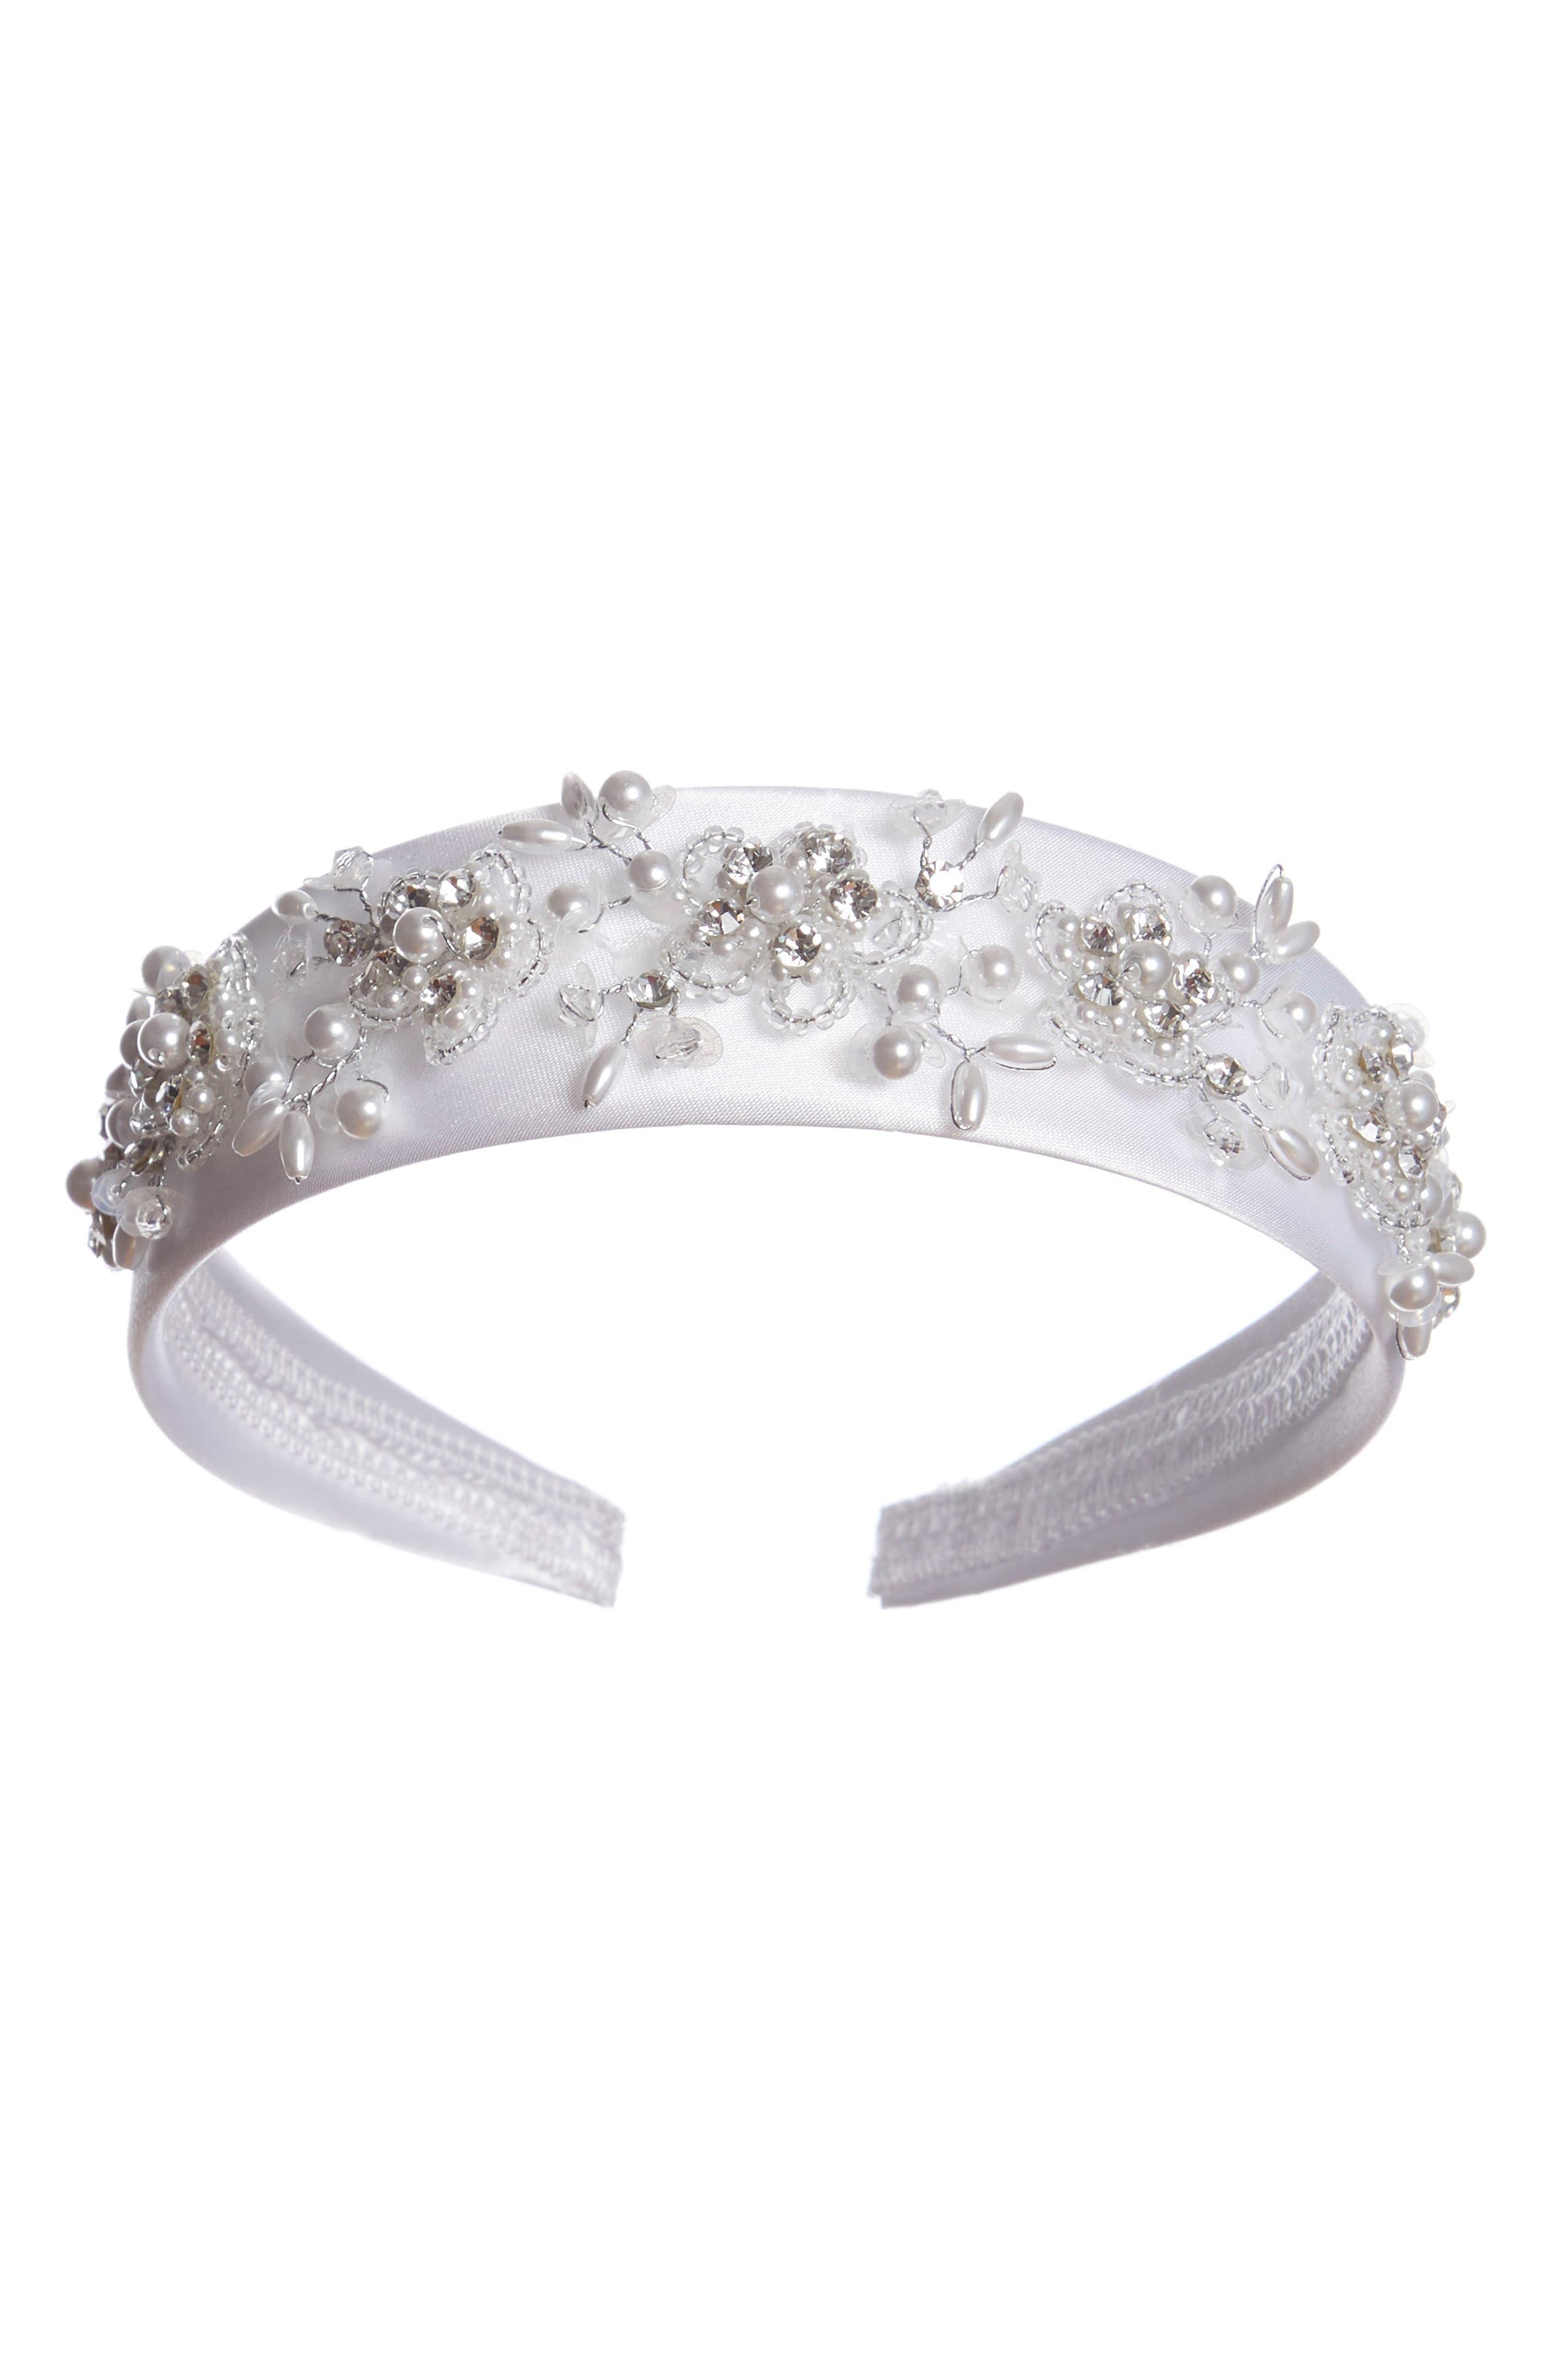 LAUREN MARIE, First Communion Crystal Headband, Main thumbnail 1, color, 100